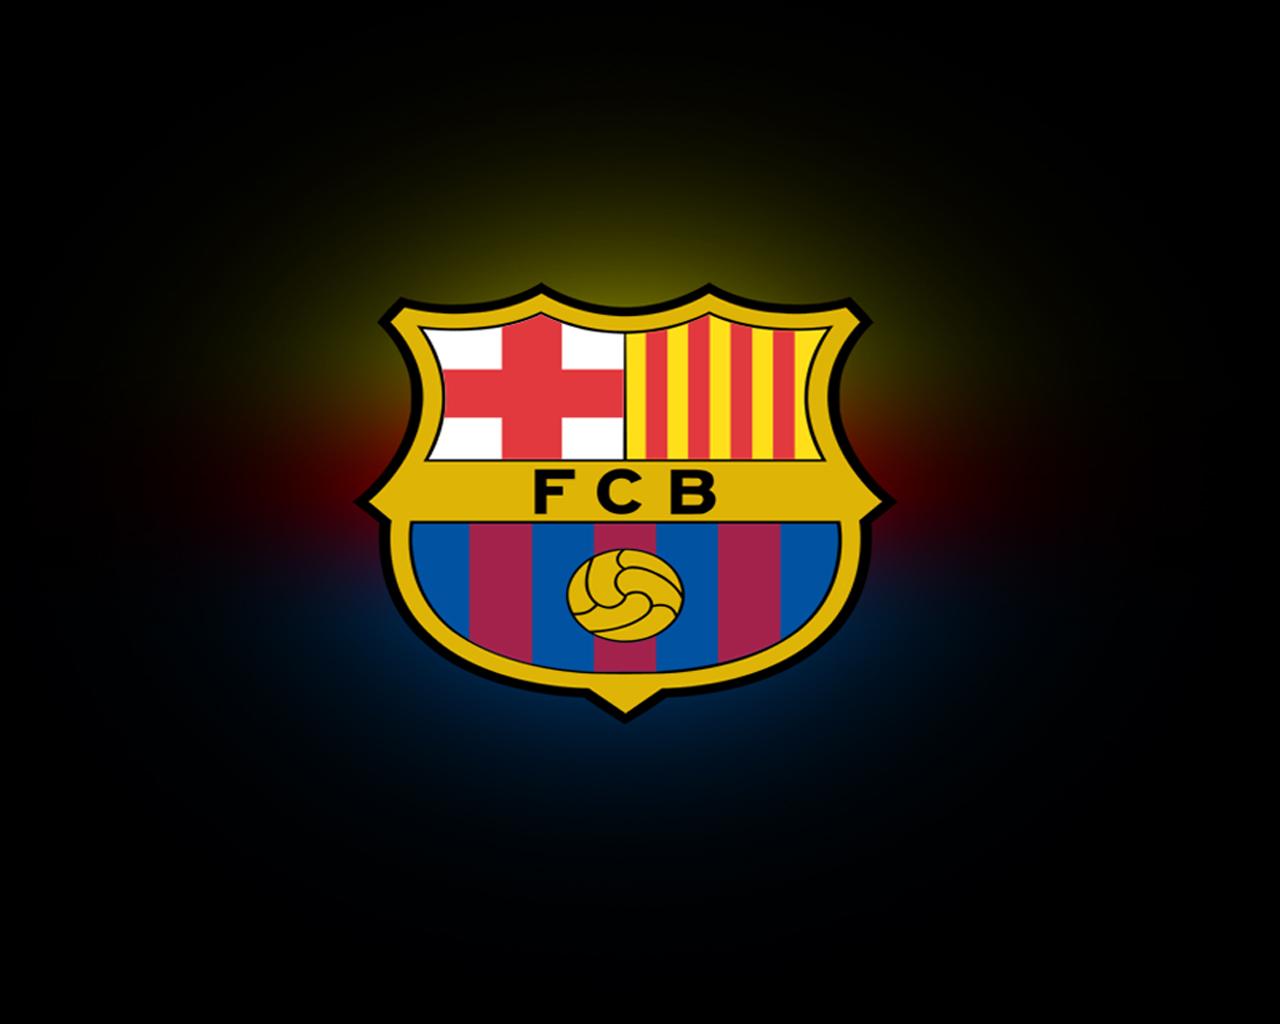 wallpaperew: FC Barcelona Logo wallpaper